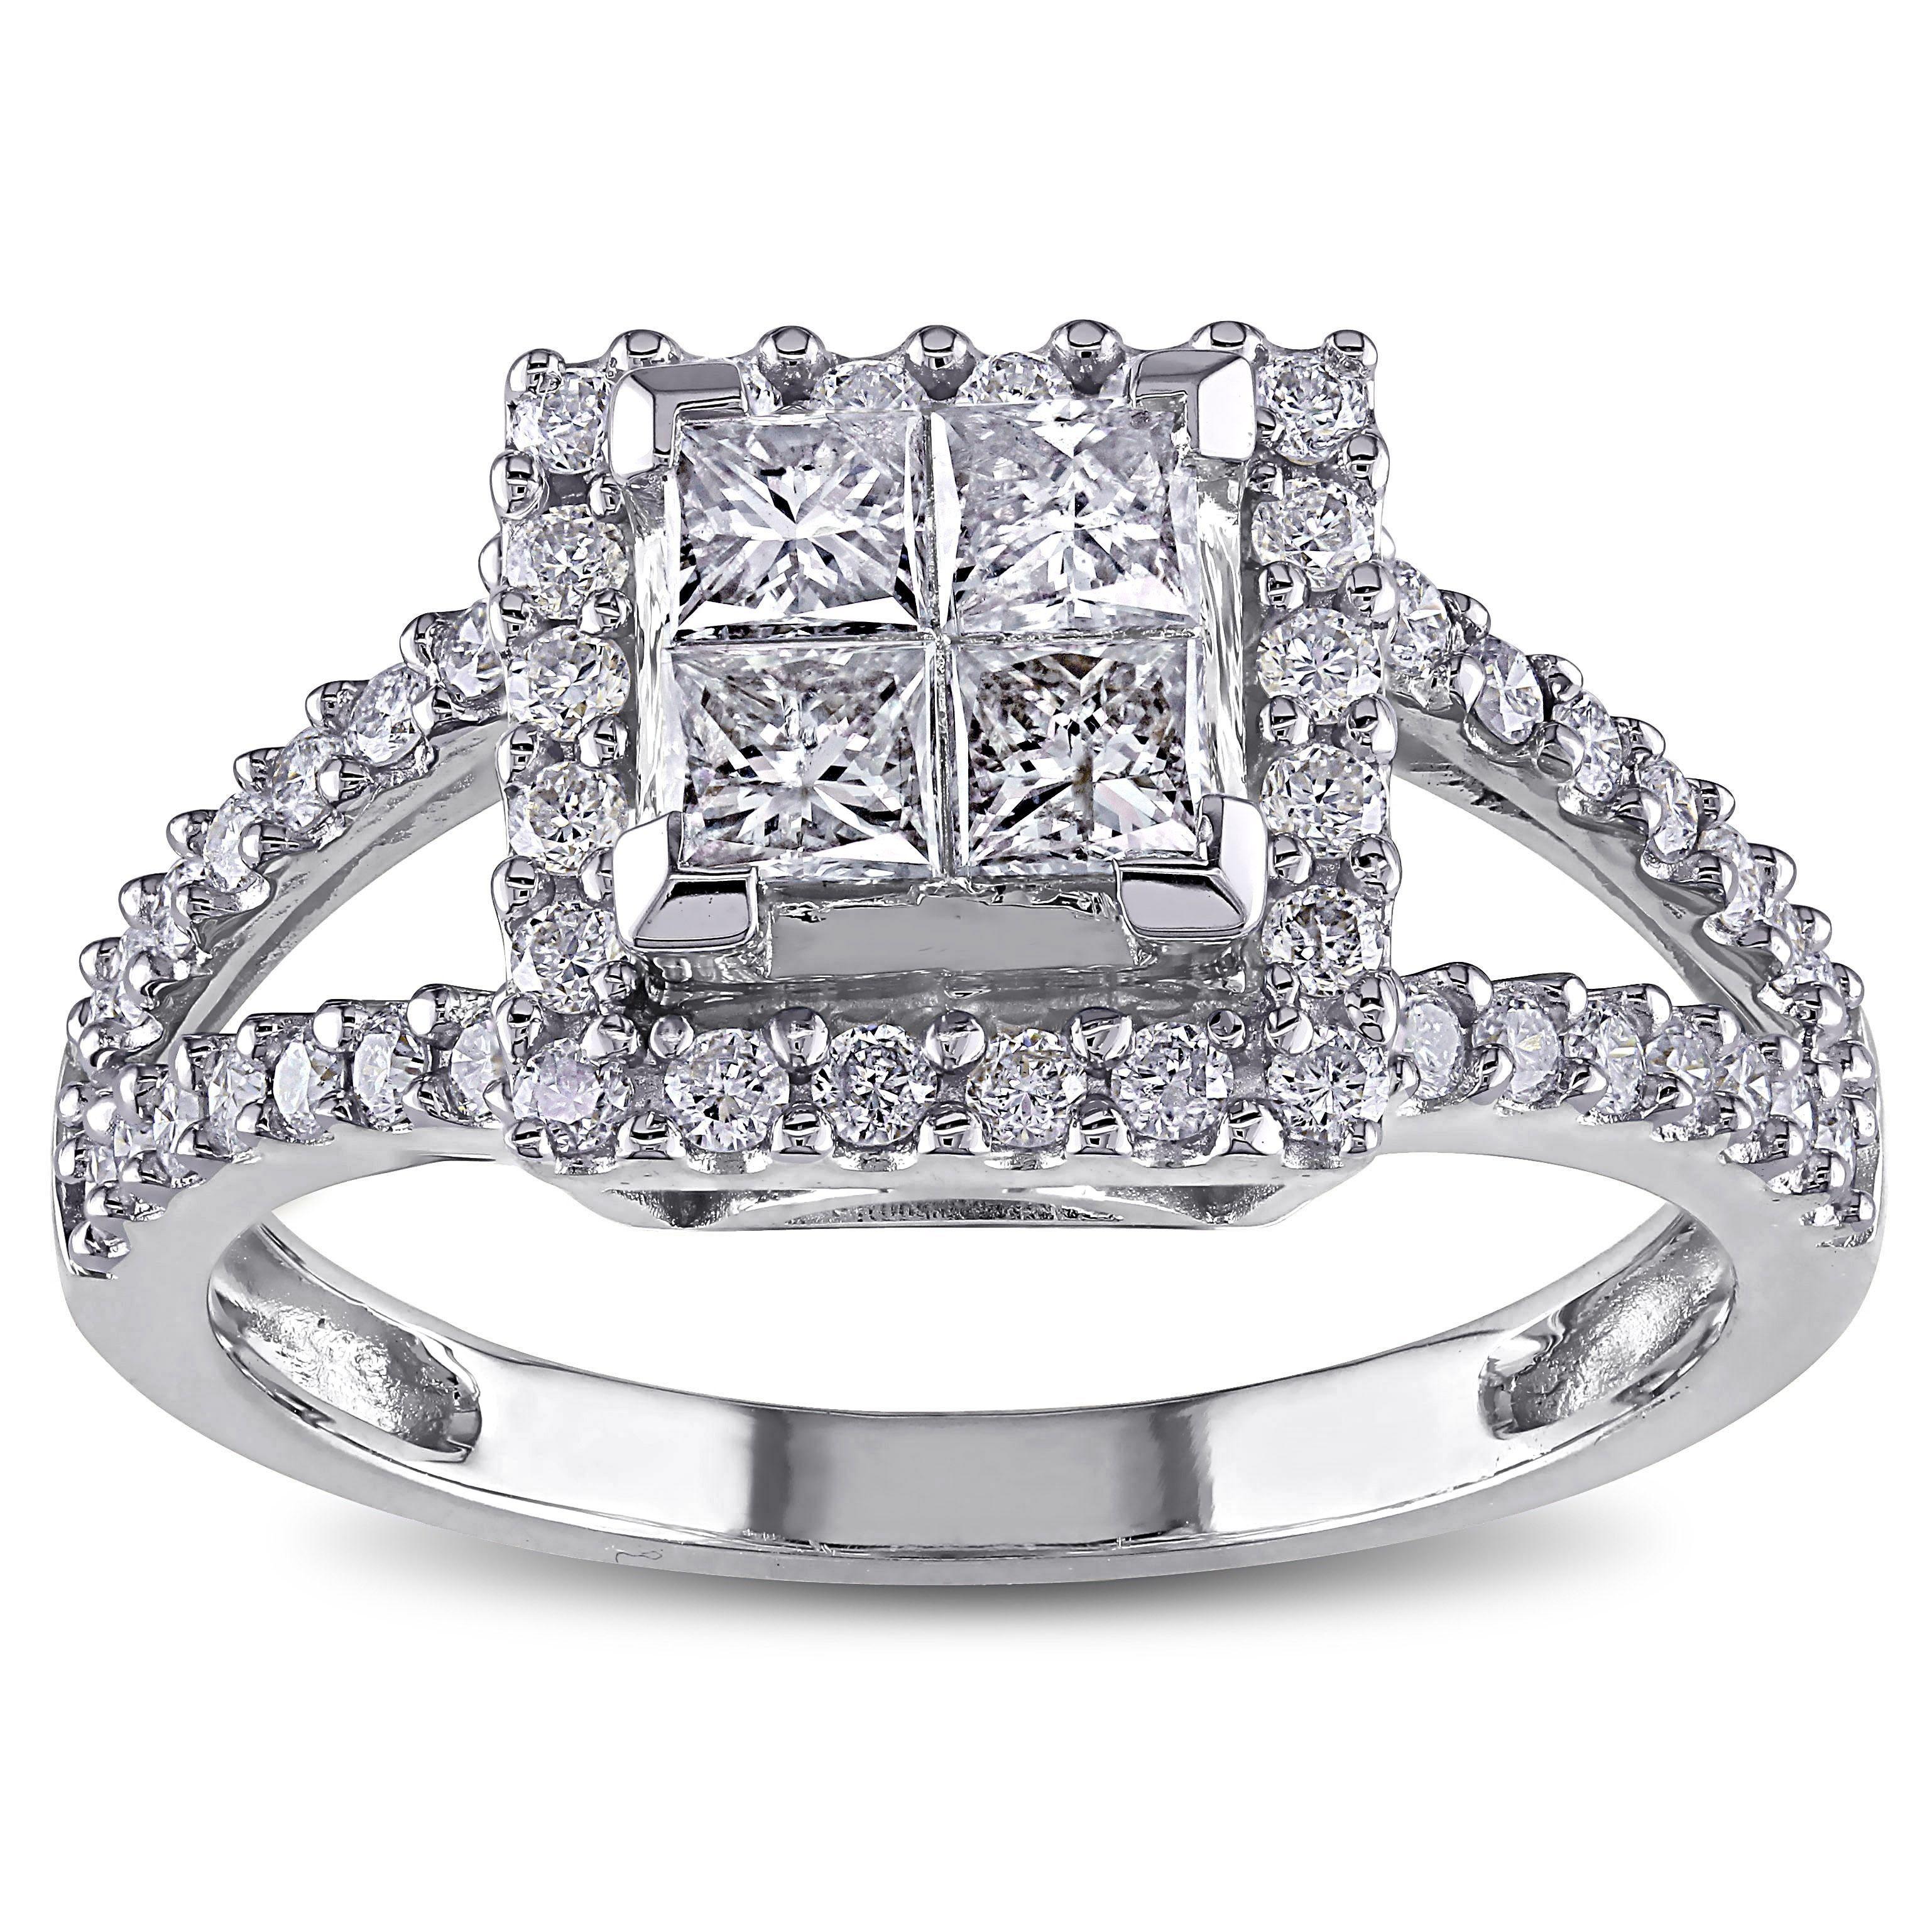 Miadora signature collection 14k white gold 1ct tdw diamond princess cut halo engagement ring h i